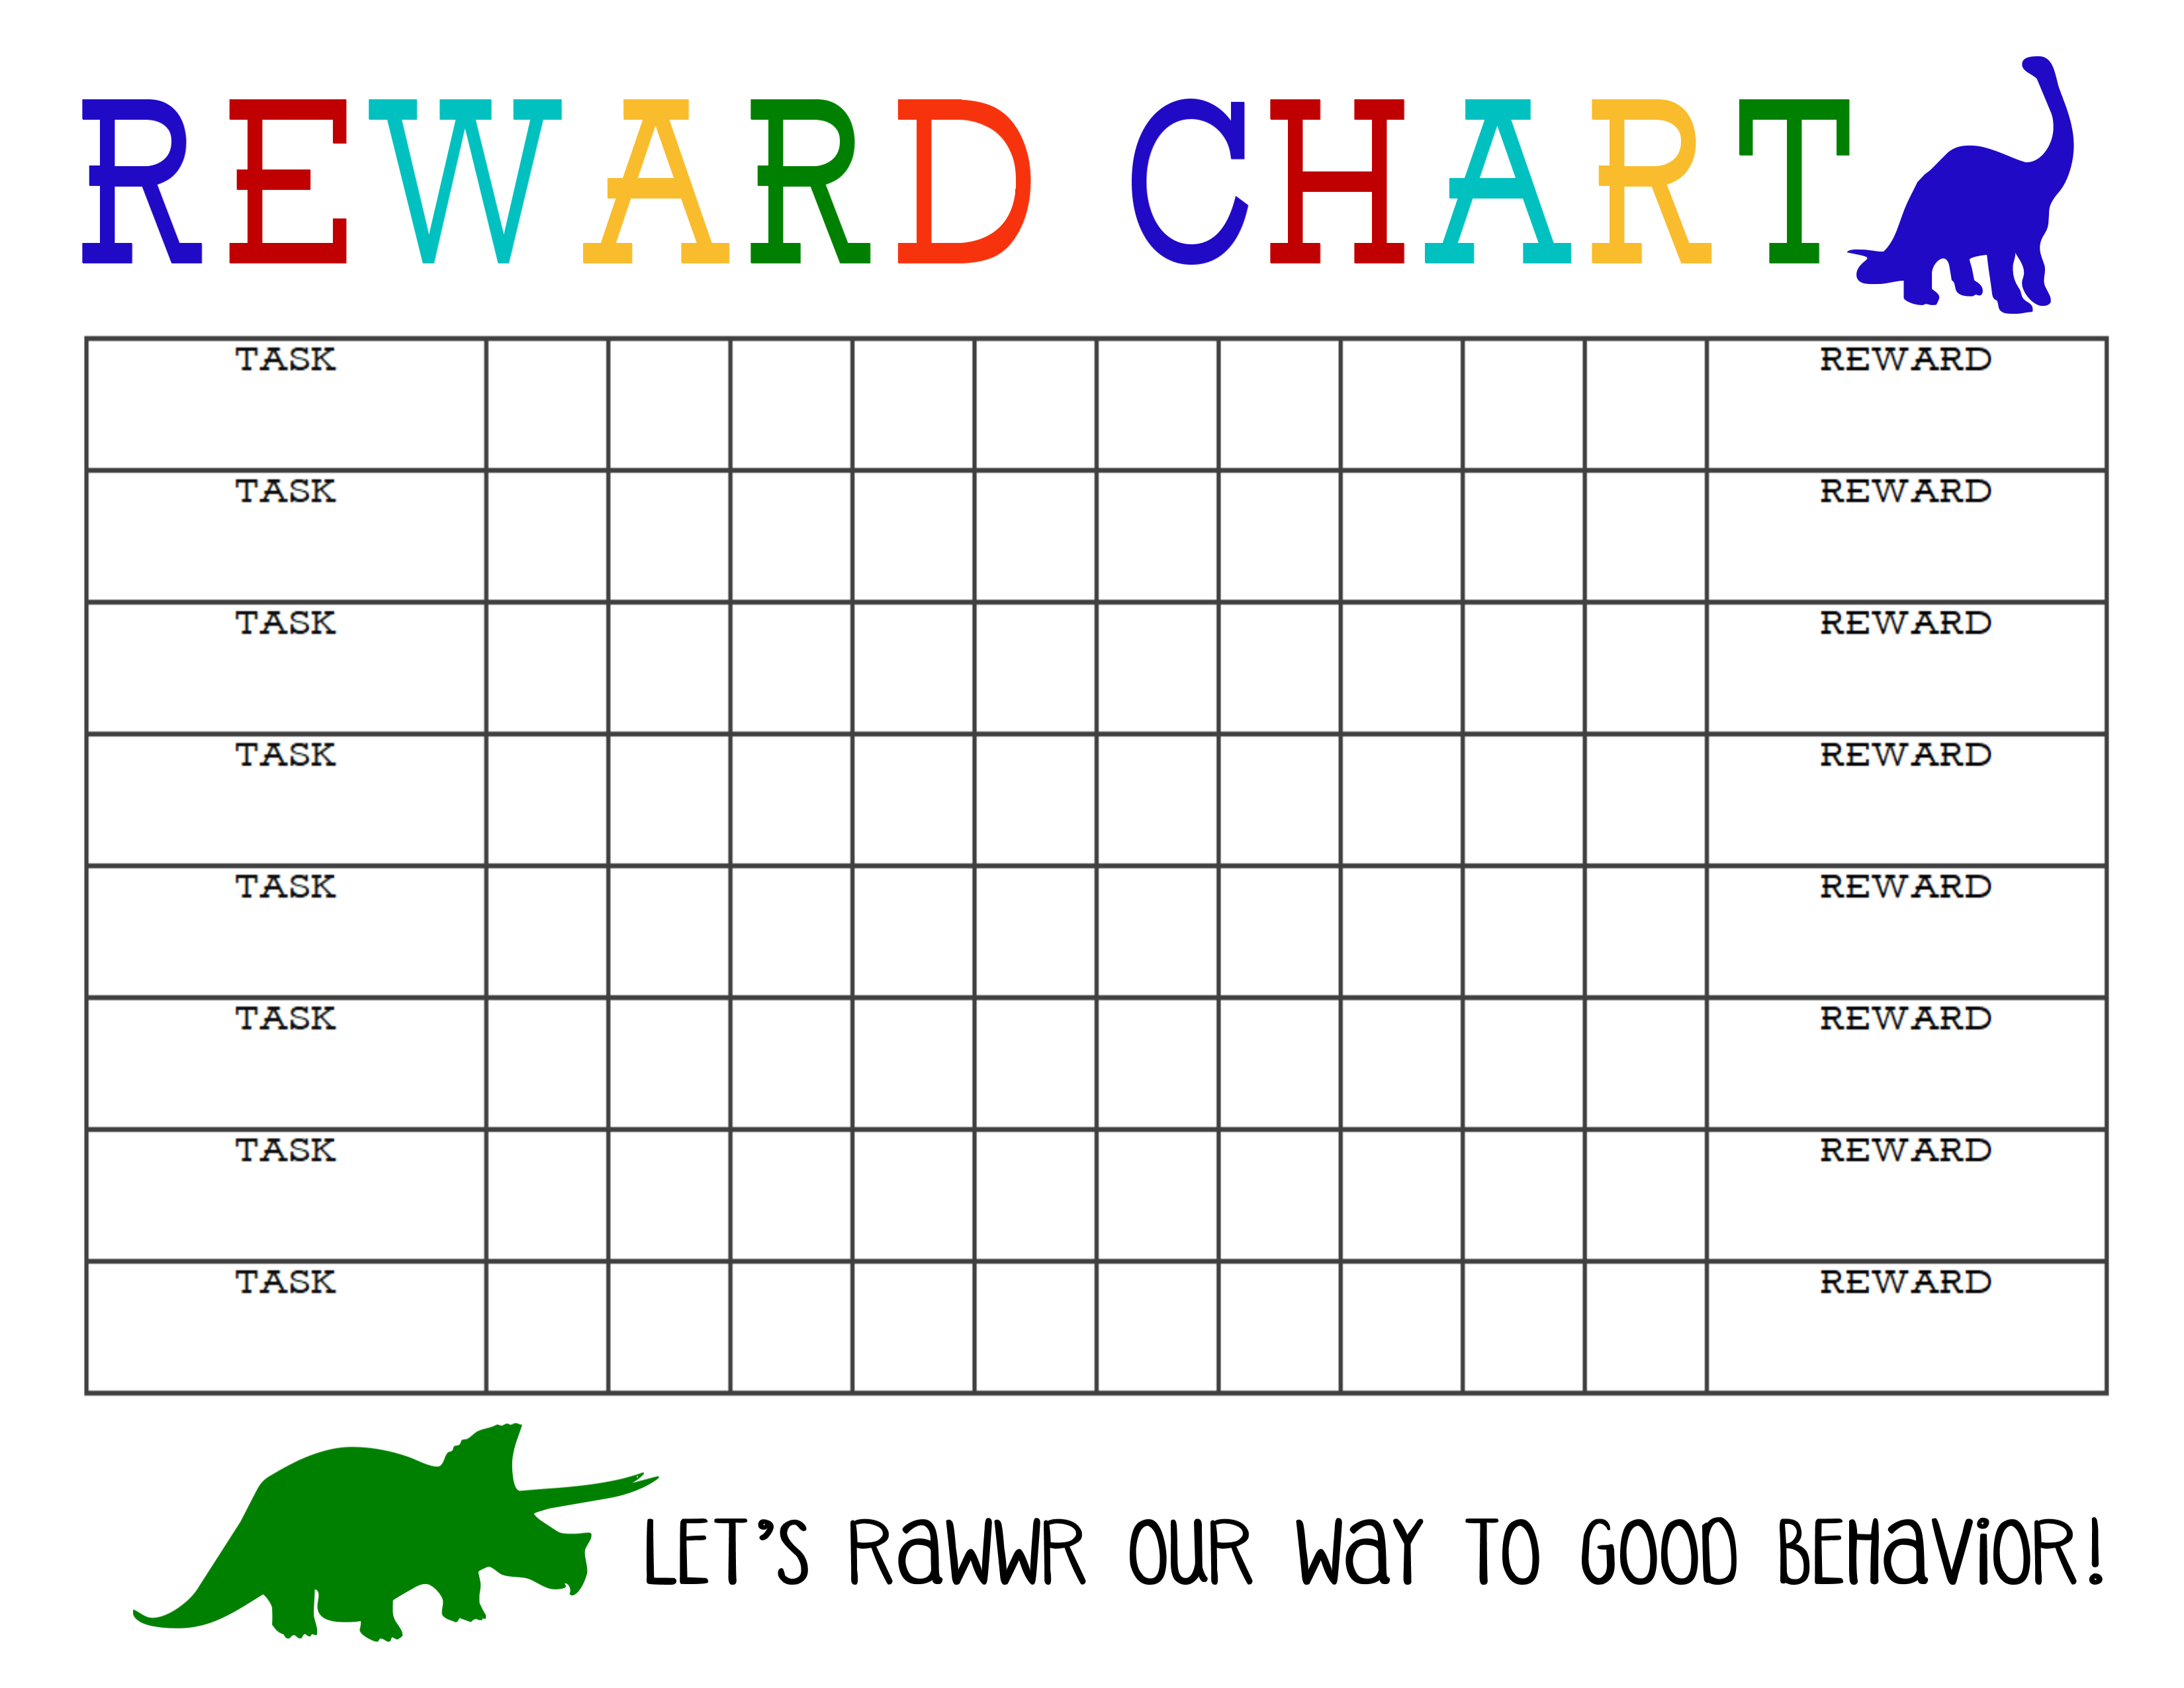 Printable Reward Chart - The Girl Creative - Free Printable Reward Charts